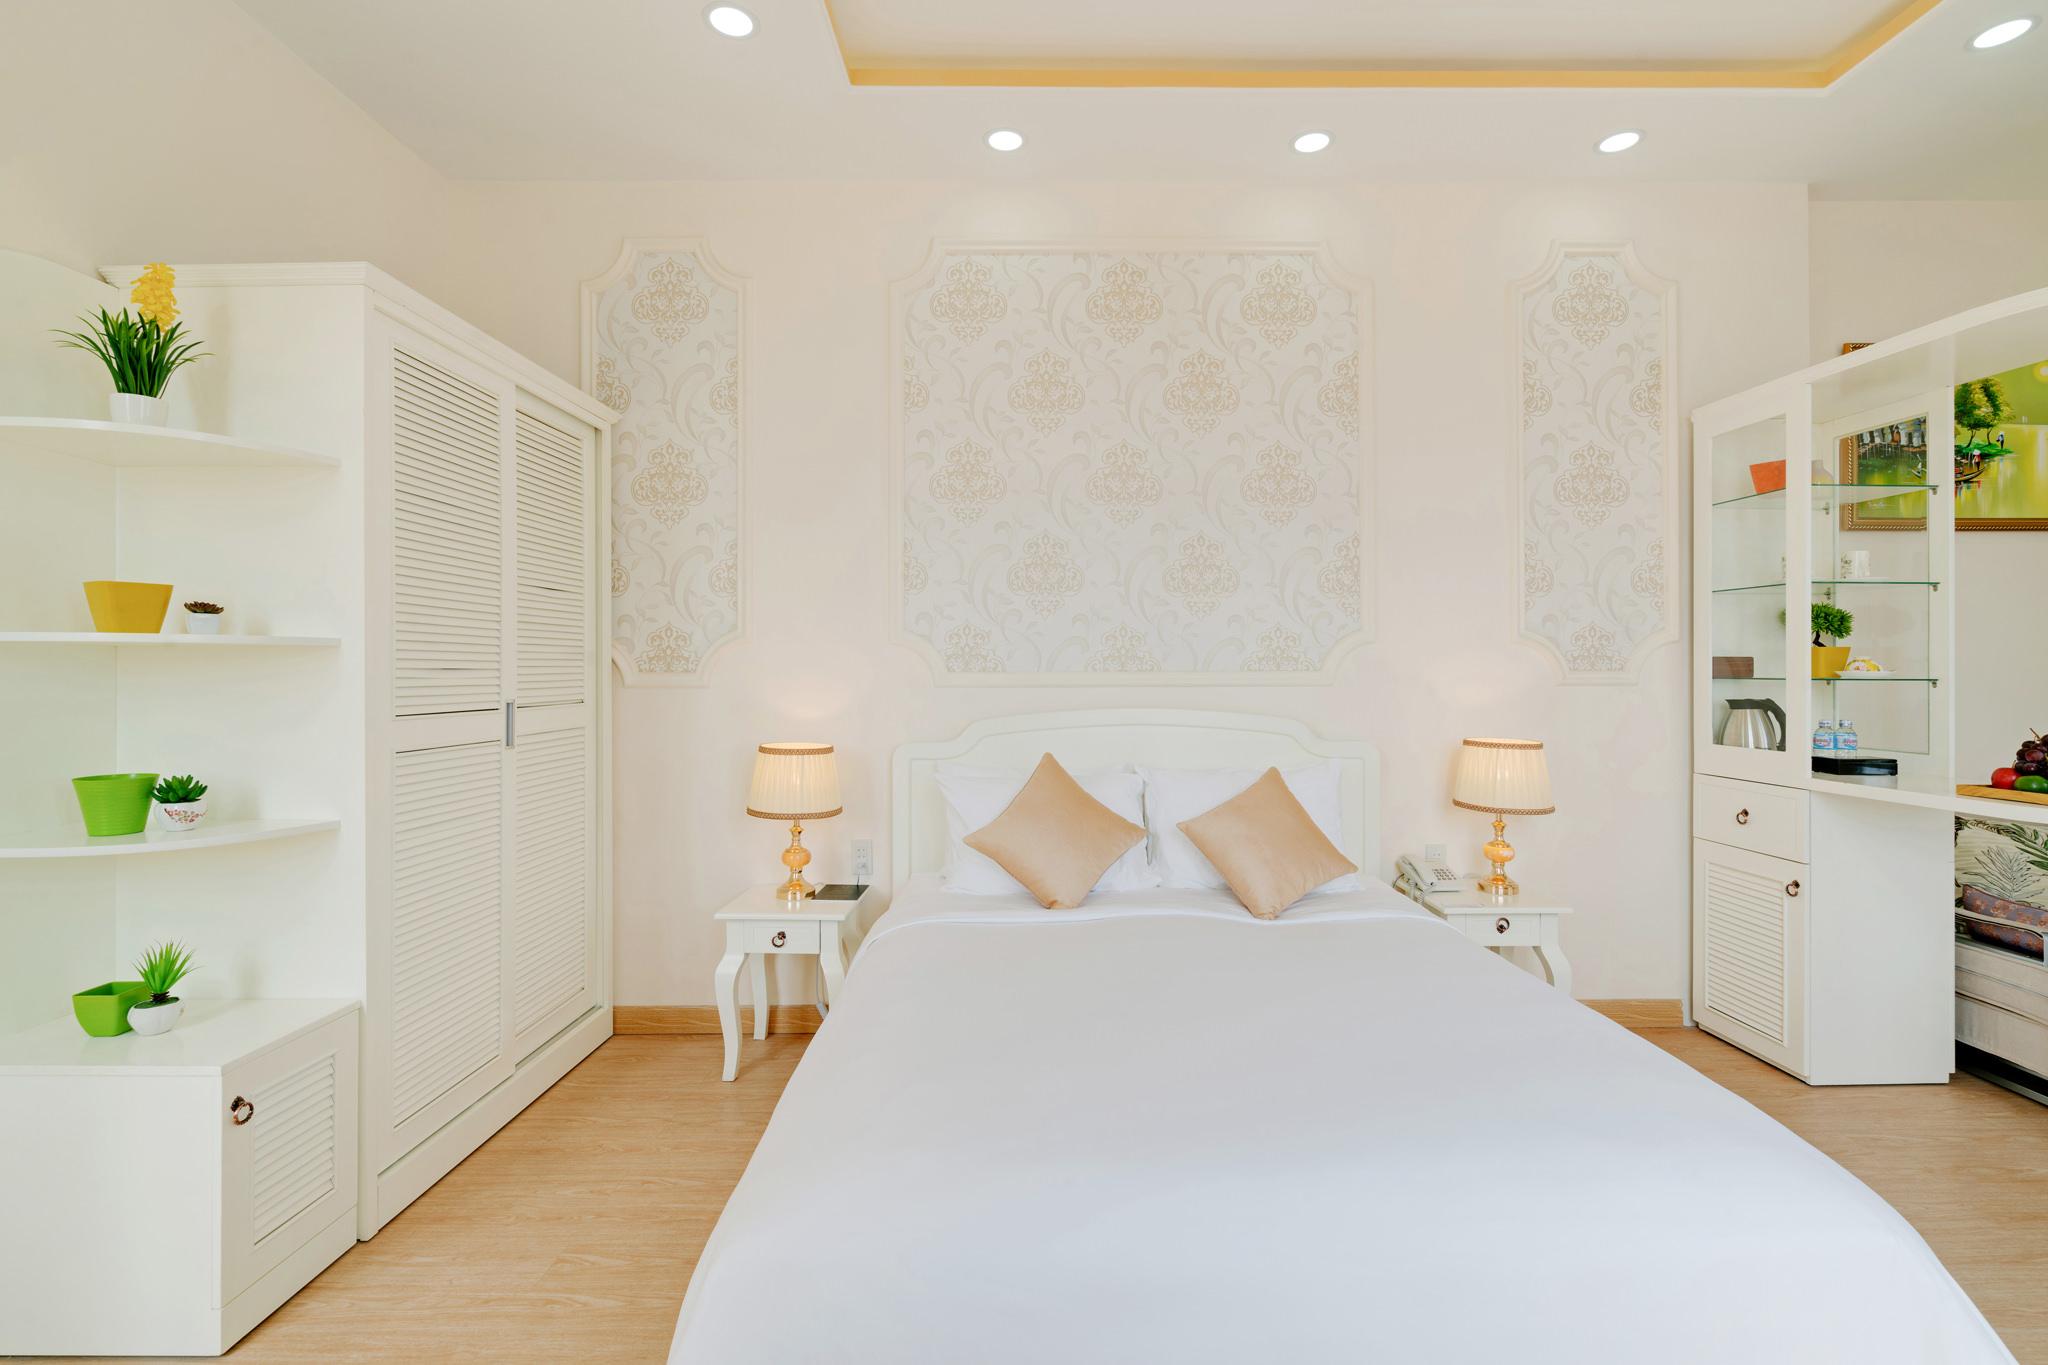 20180529 - Chez Mimosa - Interior - Hotel - 015.jpg